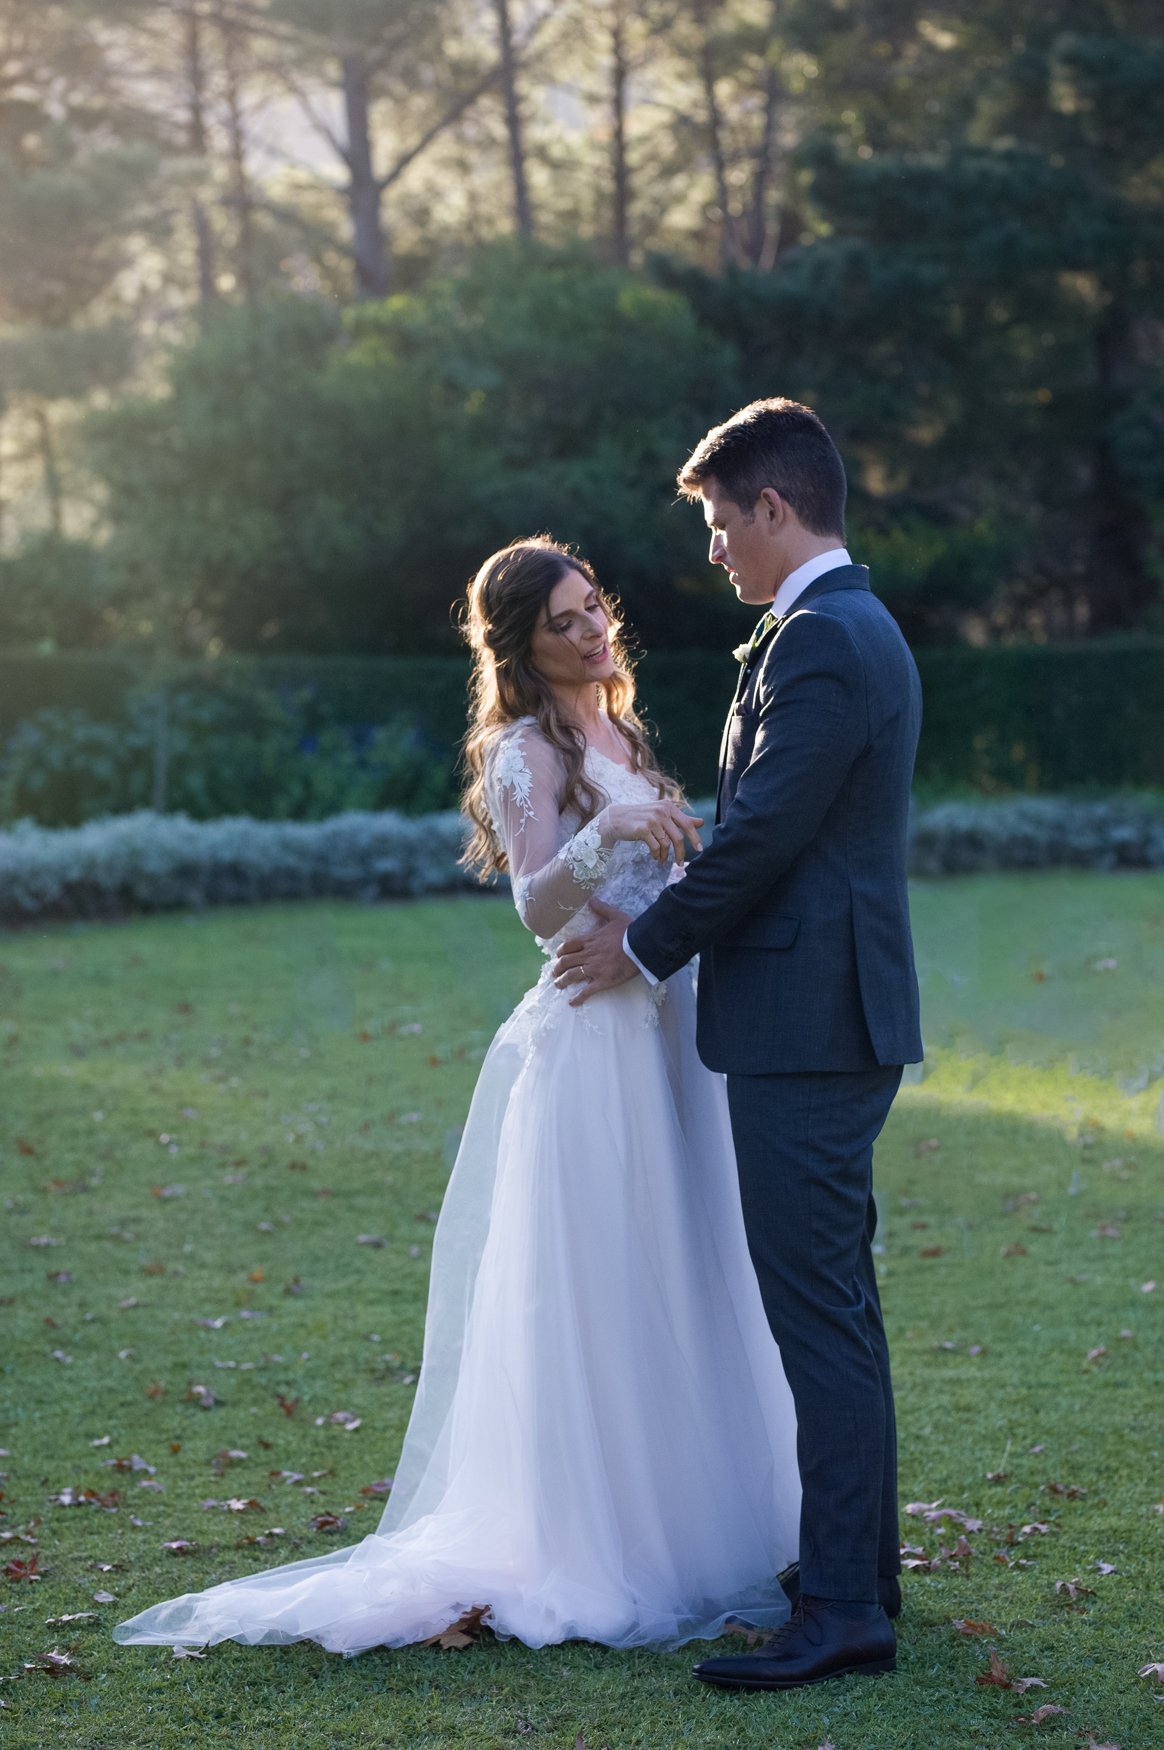 Leon_&_Martine's_Wedding_Photographs_17th_April_2019_@johnhenryweddingphoto_Low_Resolution_Web-375.JPG